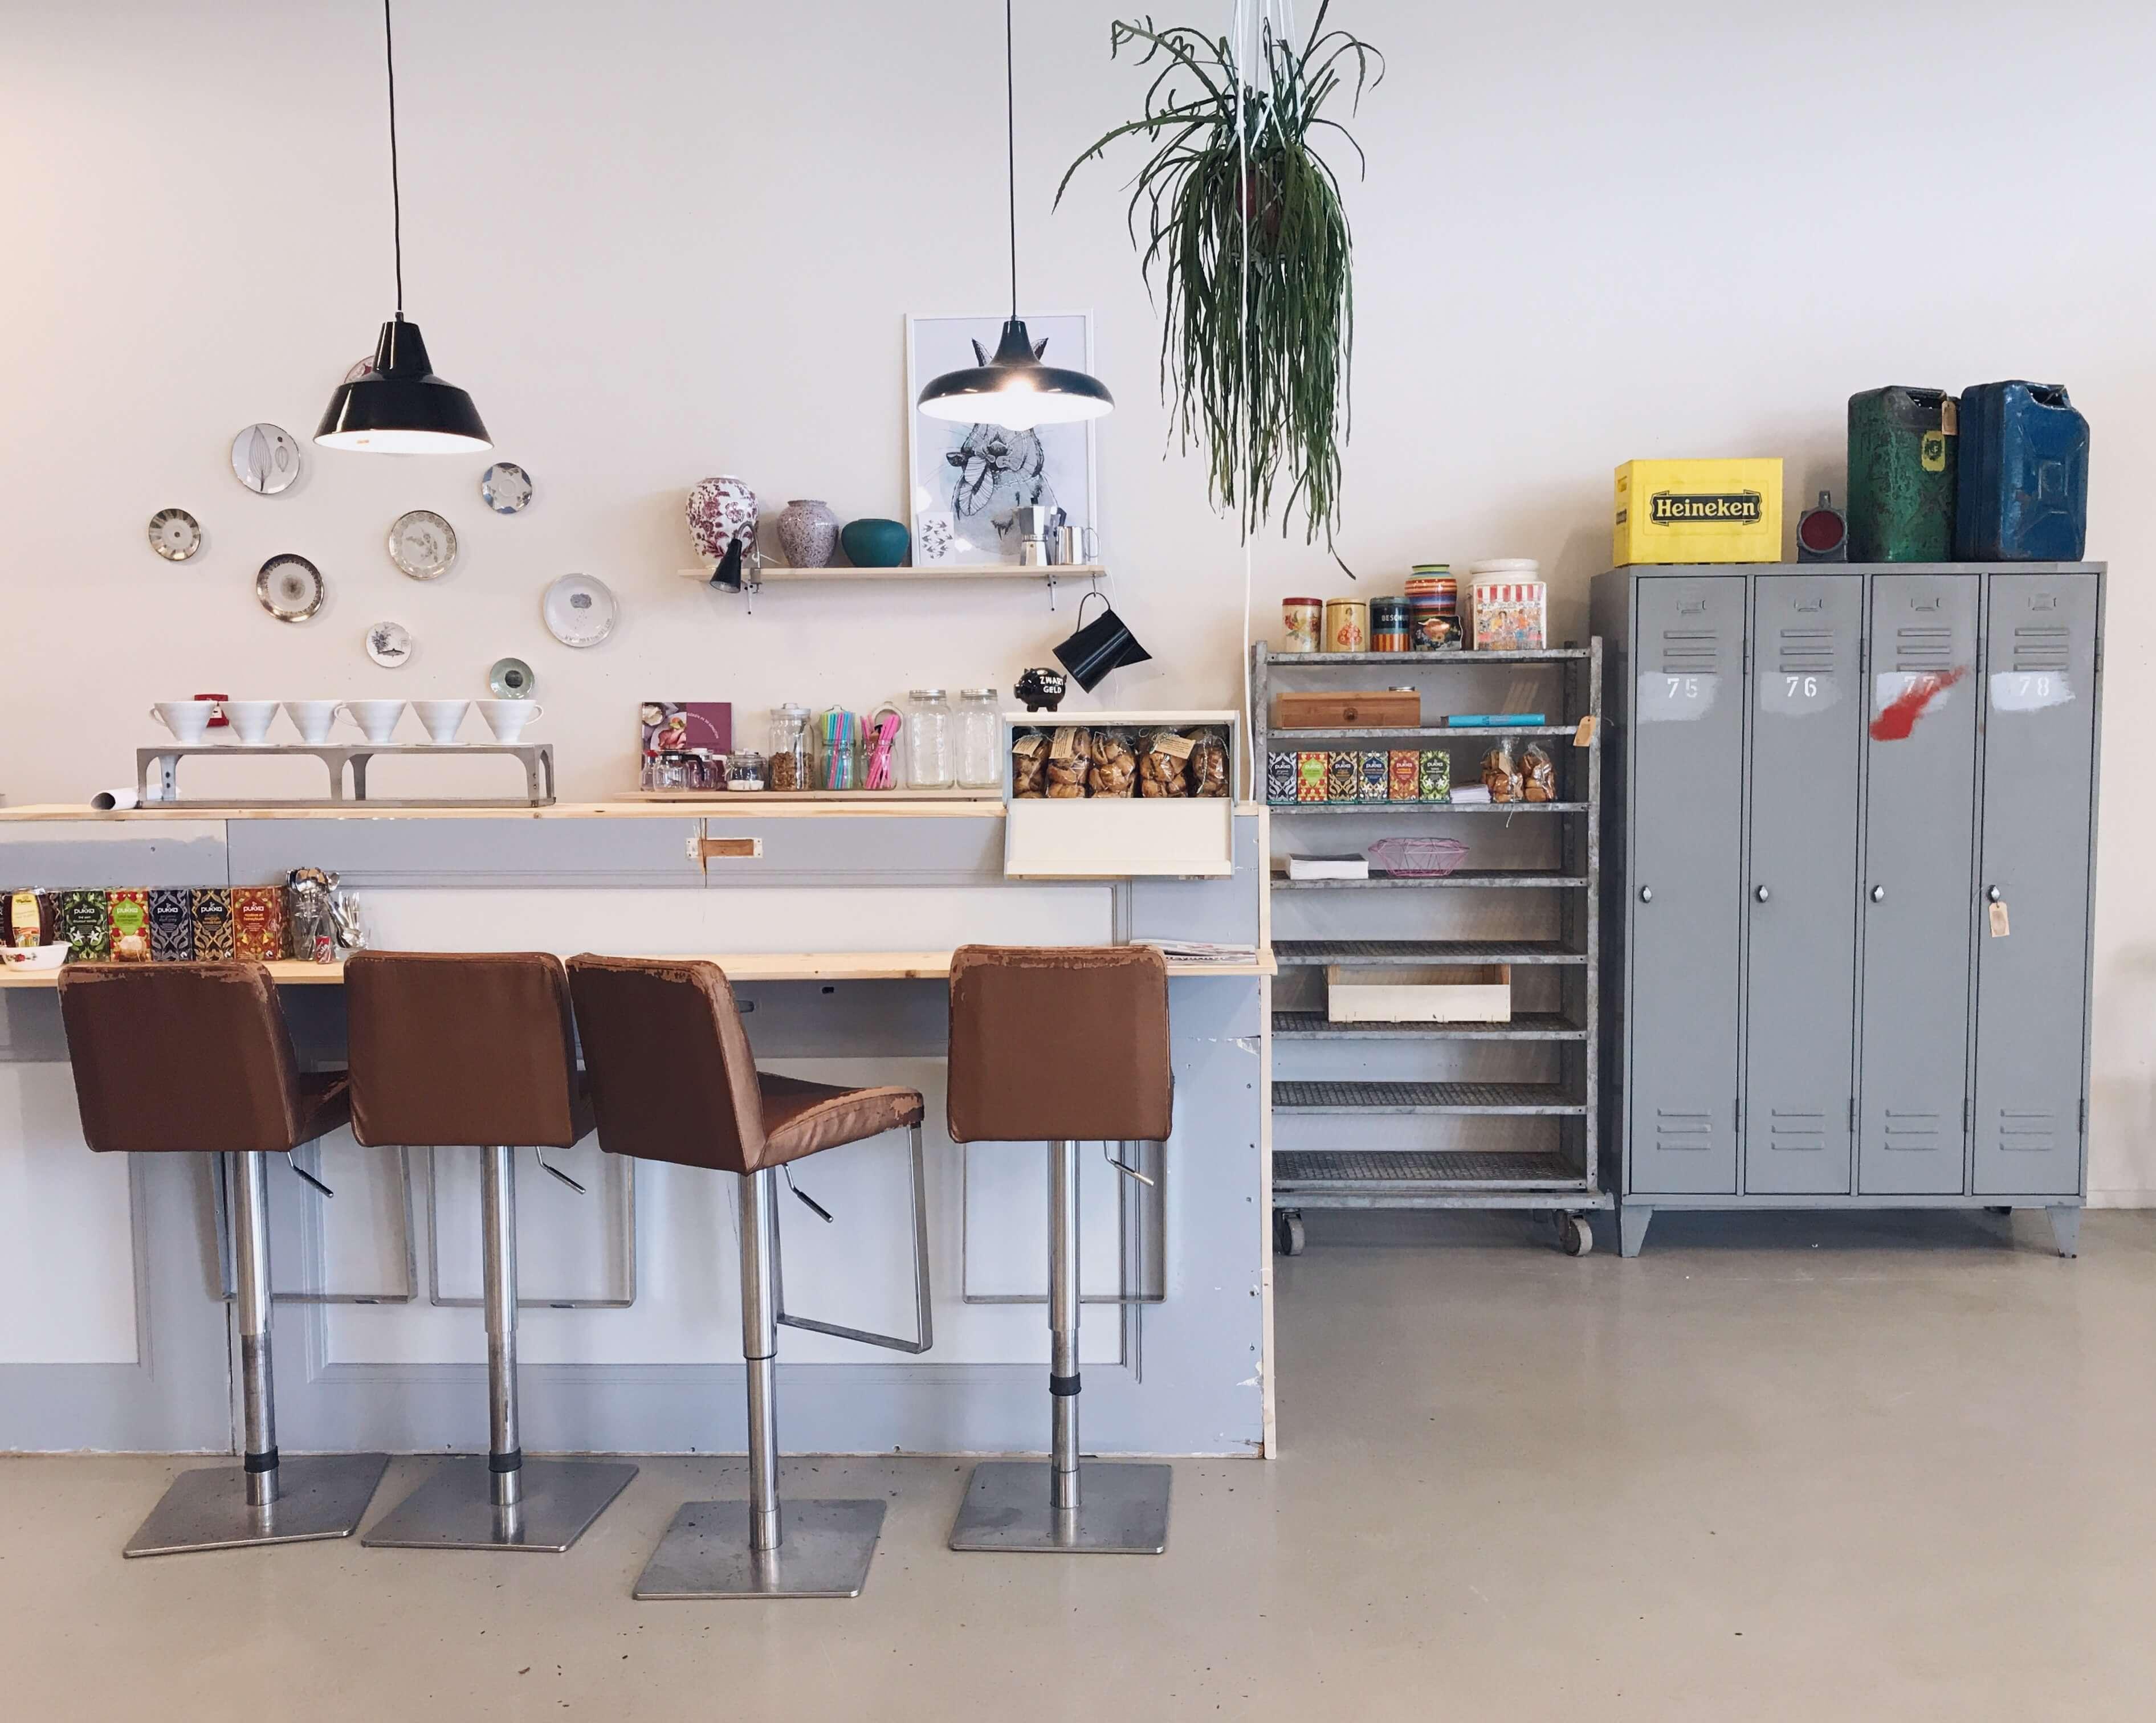 Filter Caféstore